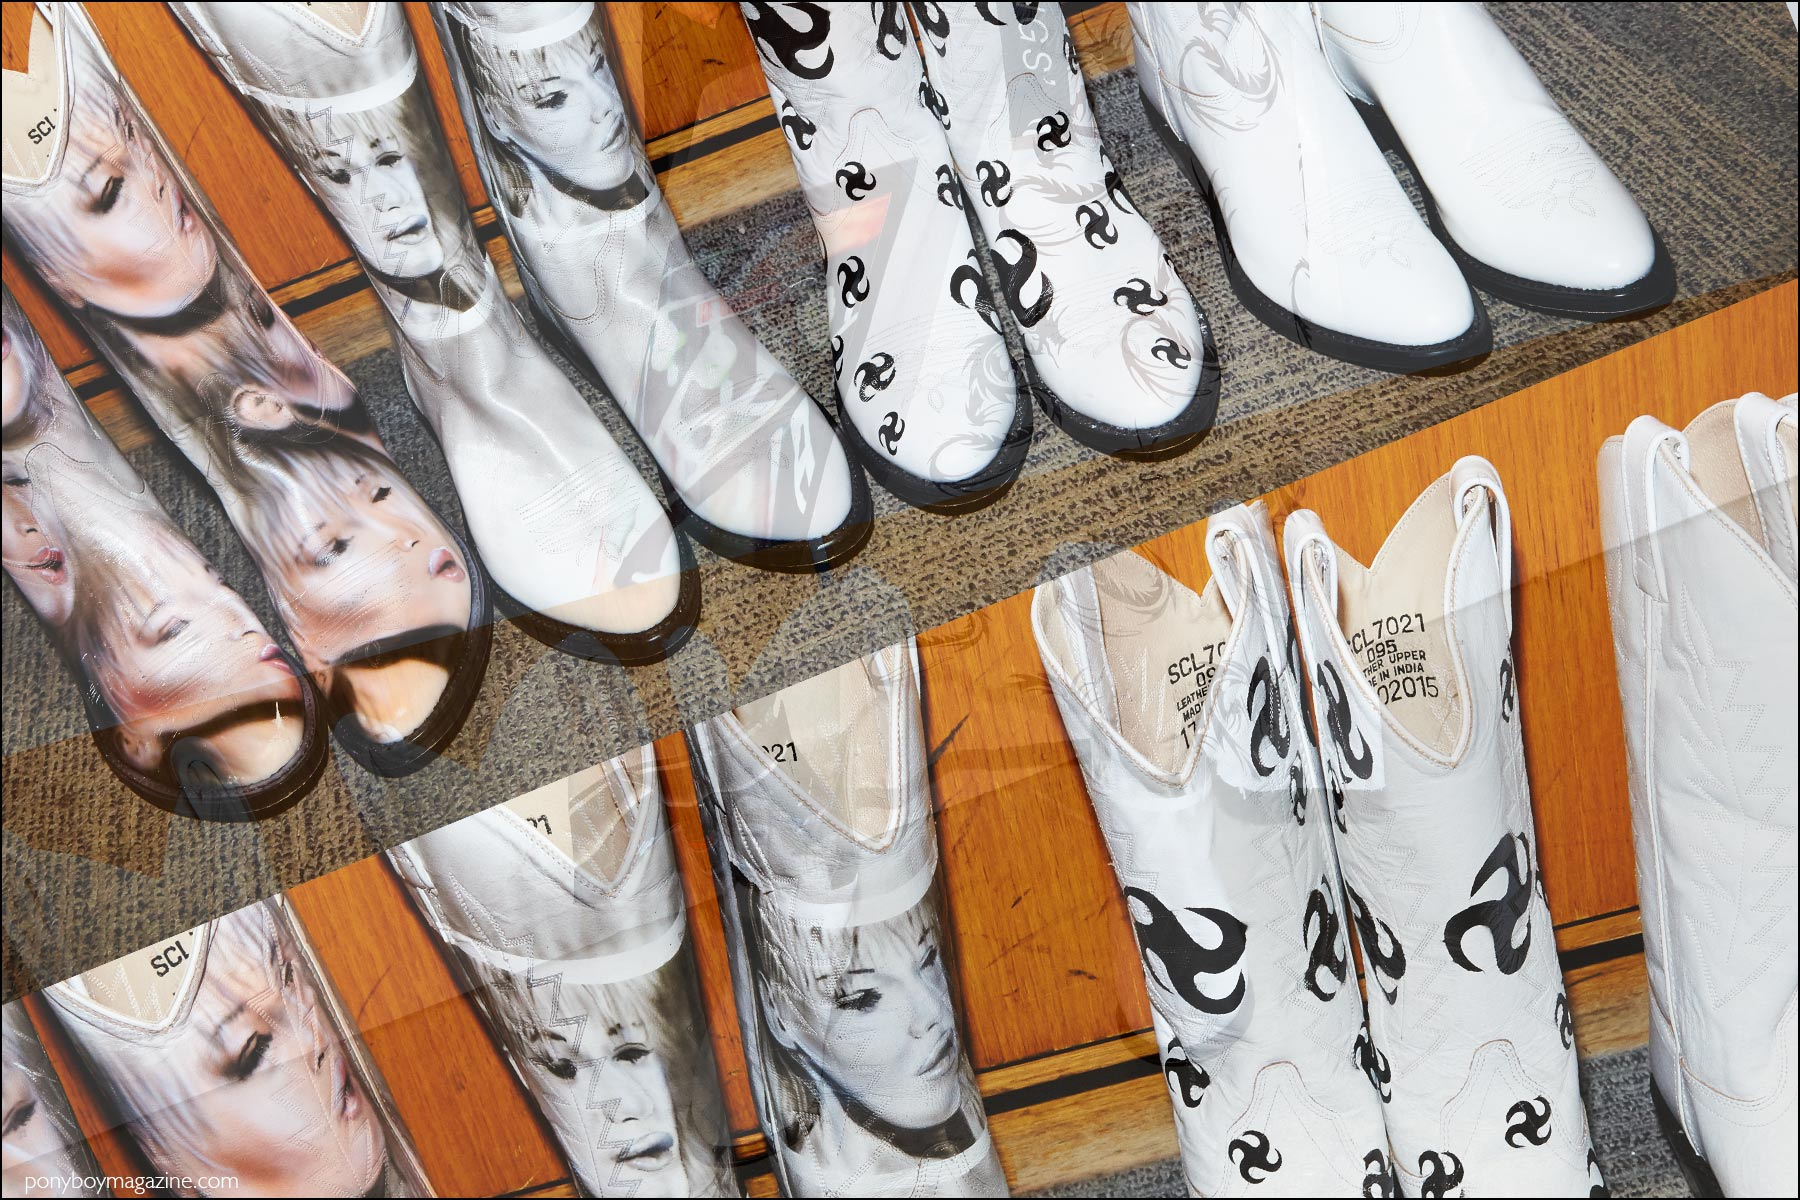 Airbrushed images on cowboy boots, backstage at Devon Halfnight Leflufy Spring/Summer 2017. Photography by Alexander Thompson for Ponyboy magazine NY.